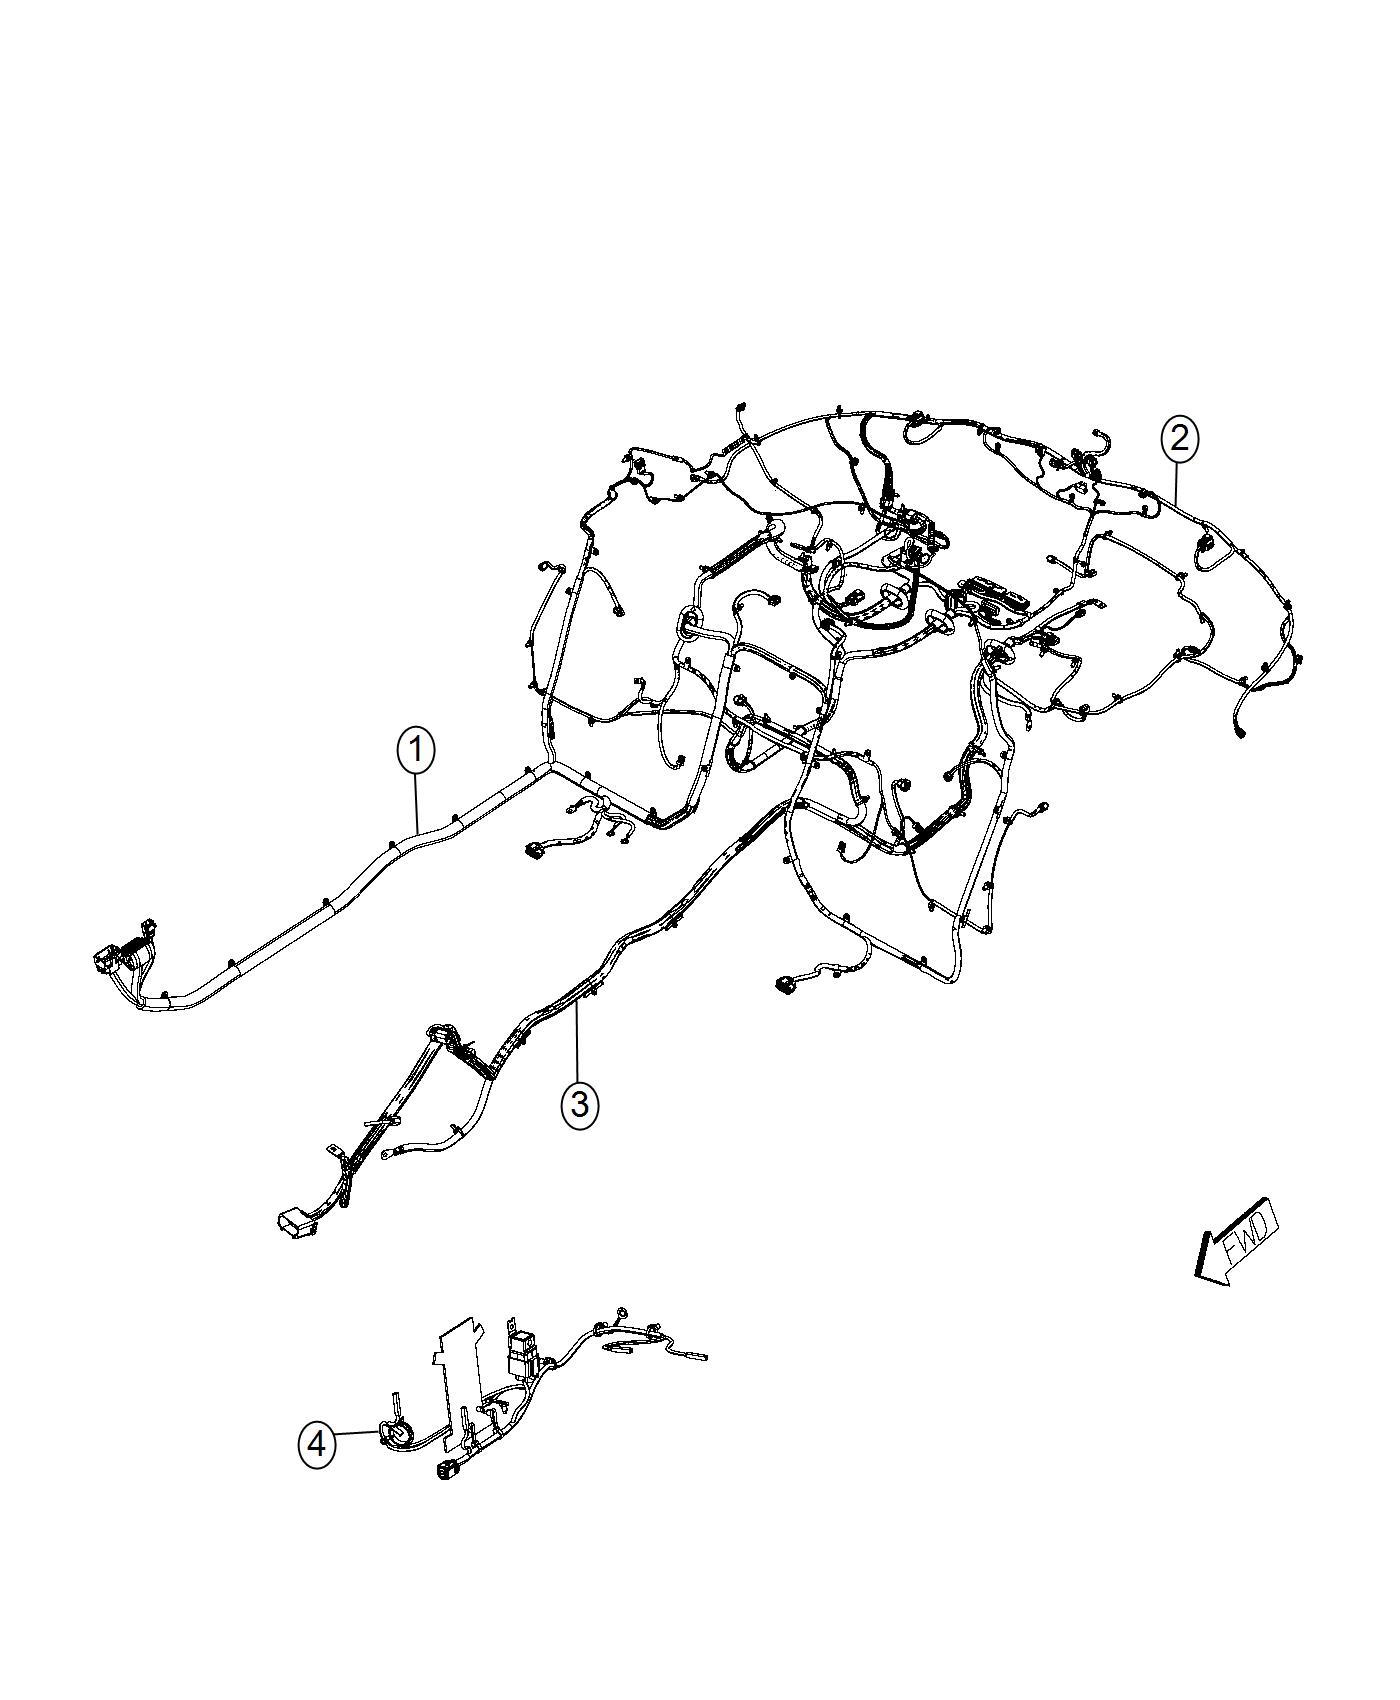 Viper 5x04 Wiring Diagram